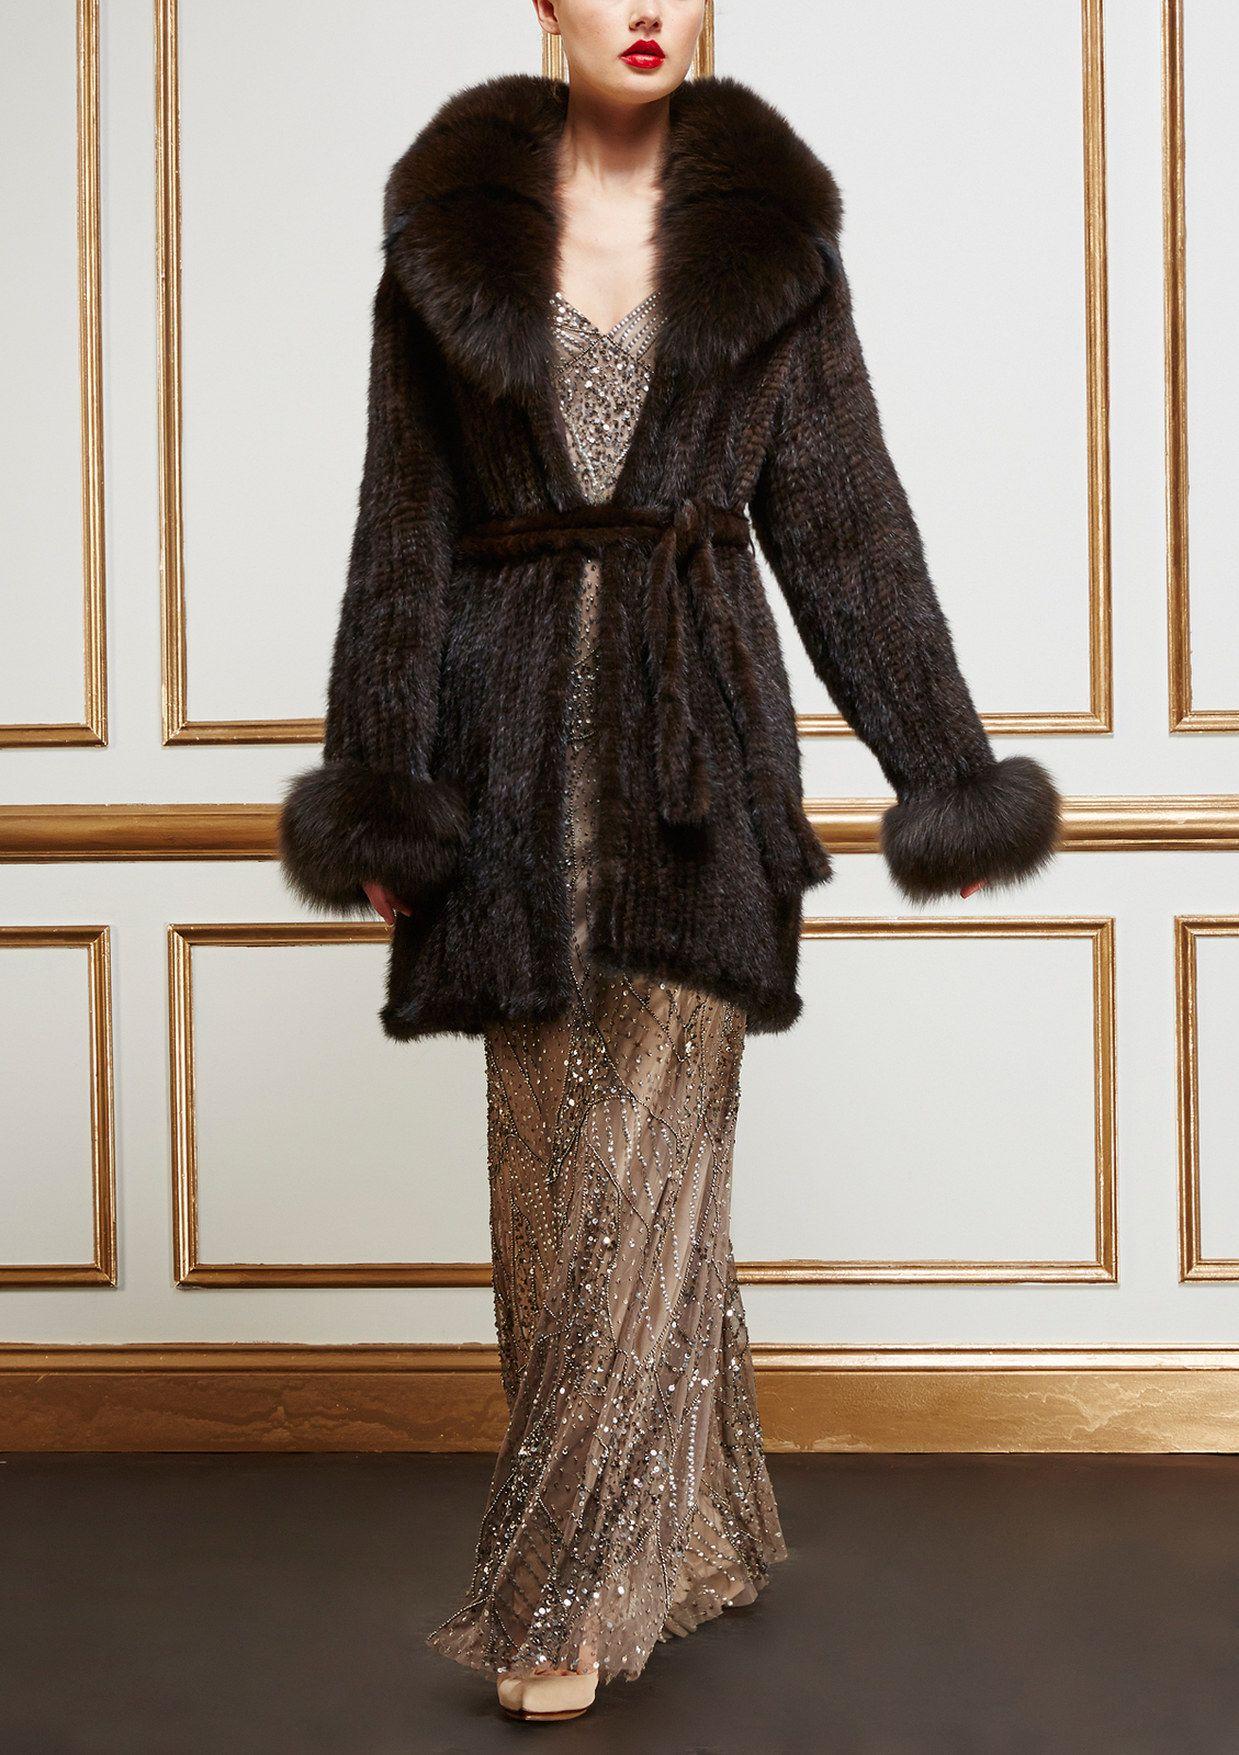 AVANTE Fur Jacket with Oversize Collar | ideel